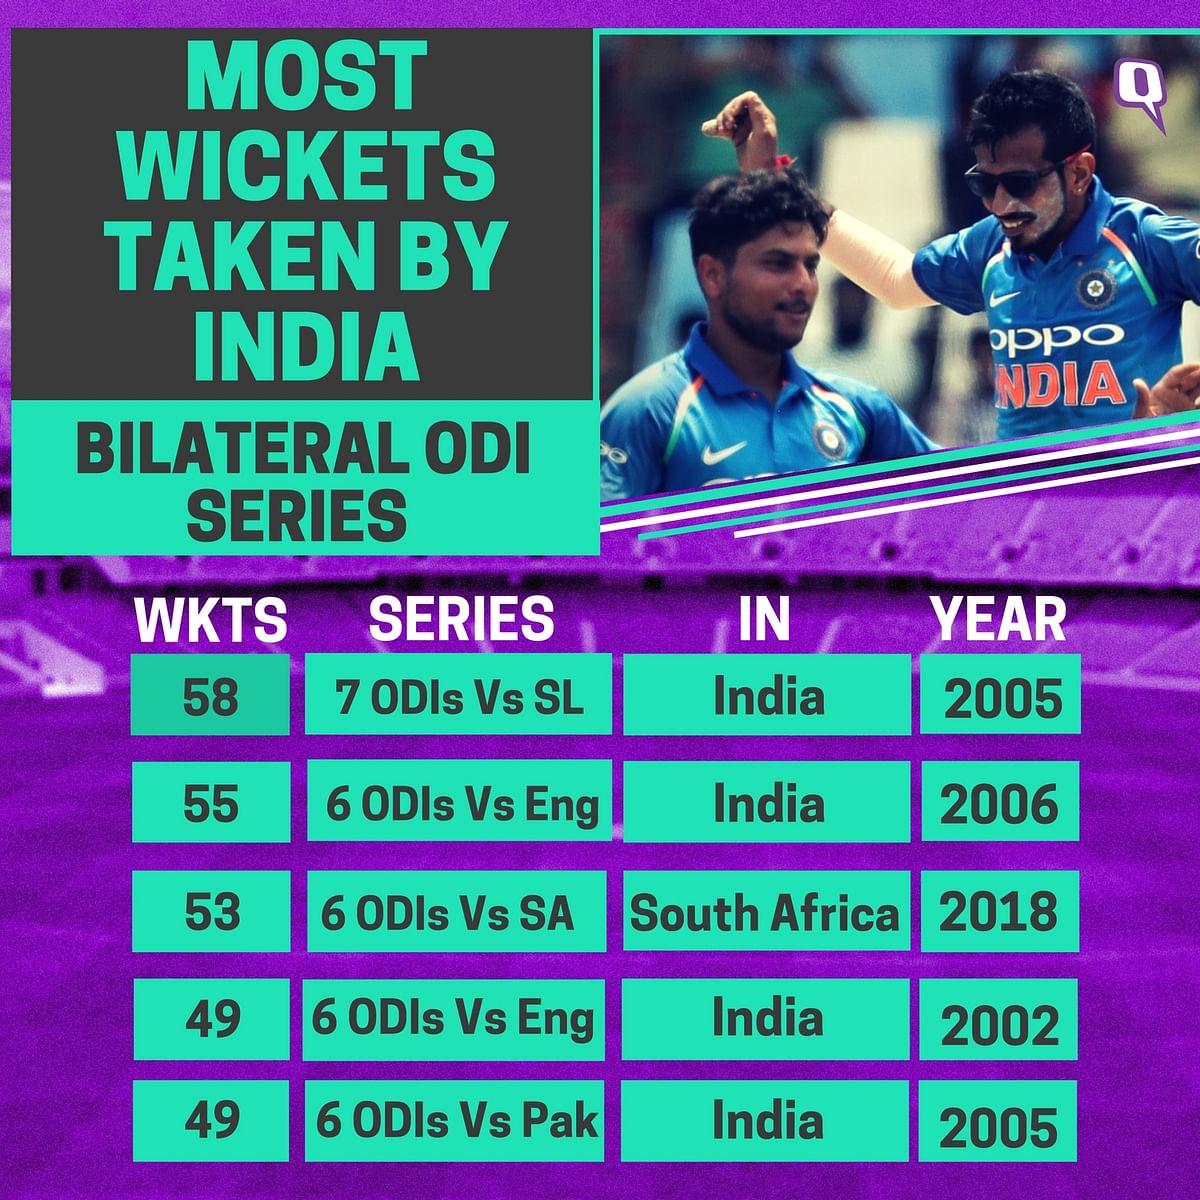 Kohli's Century Takes India to 5-1 Series Win Over South Africa